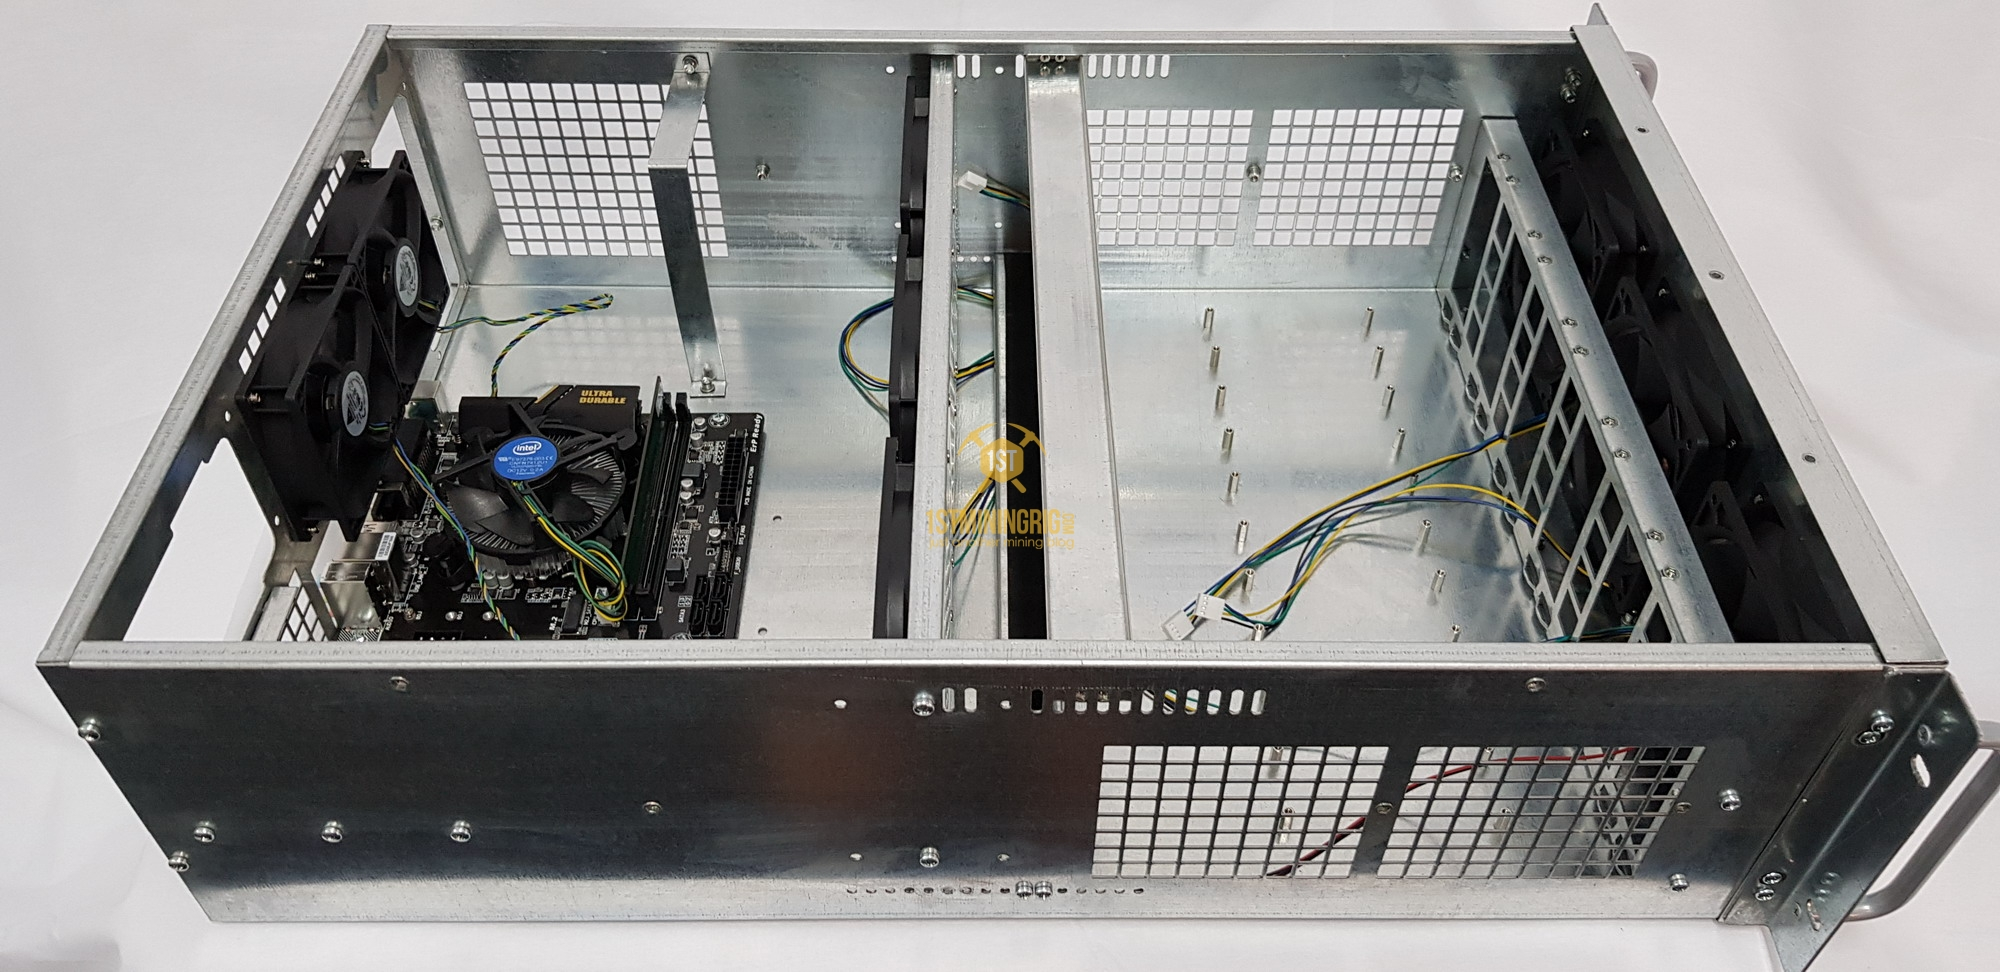 6x Gpu Mining Server Case 4u Rackmount Chassis 1st